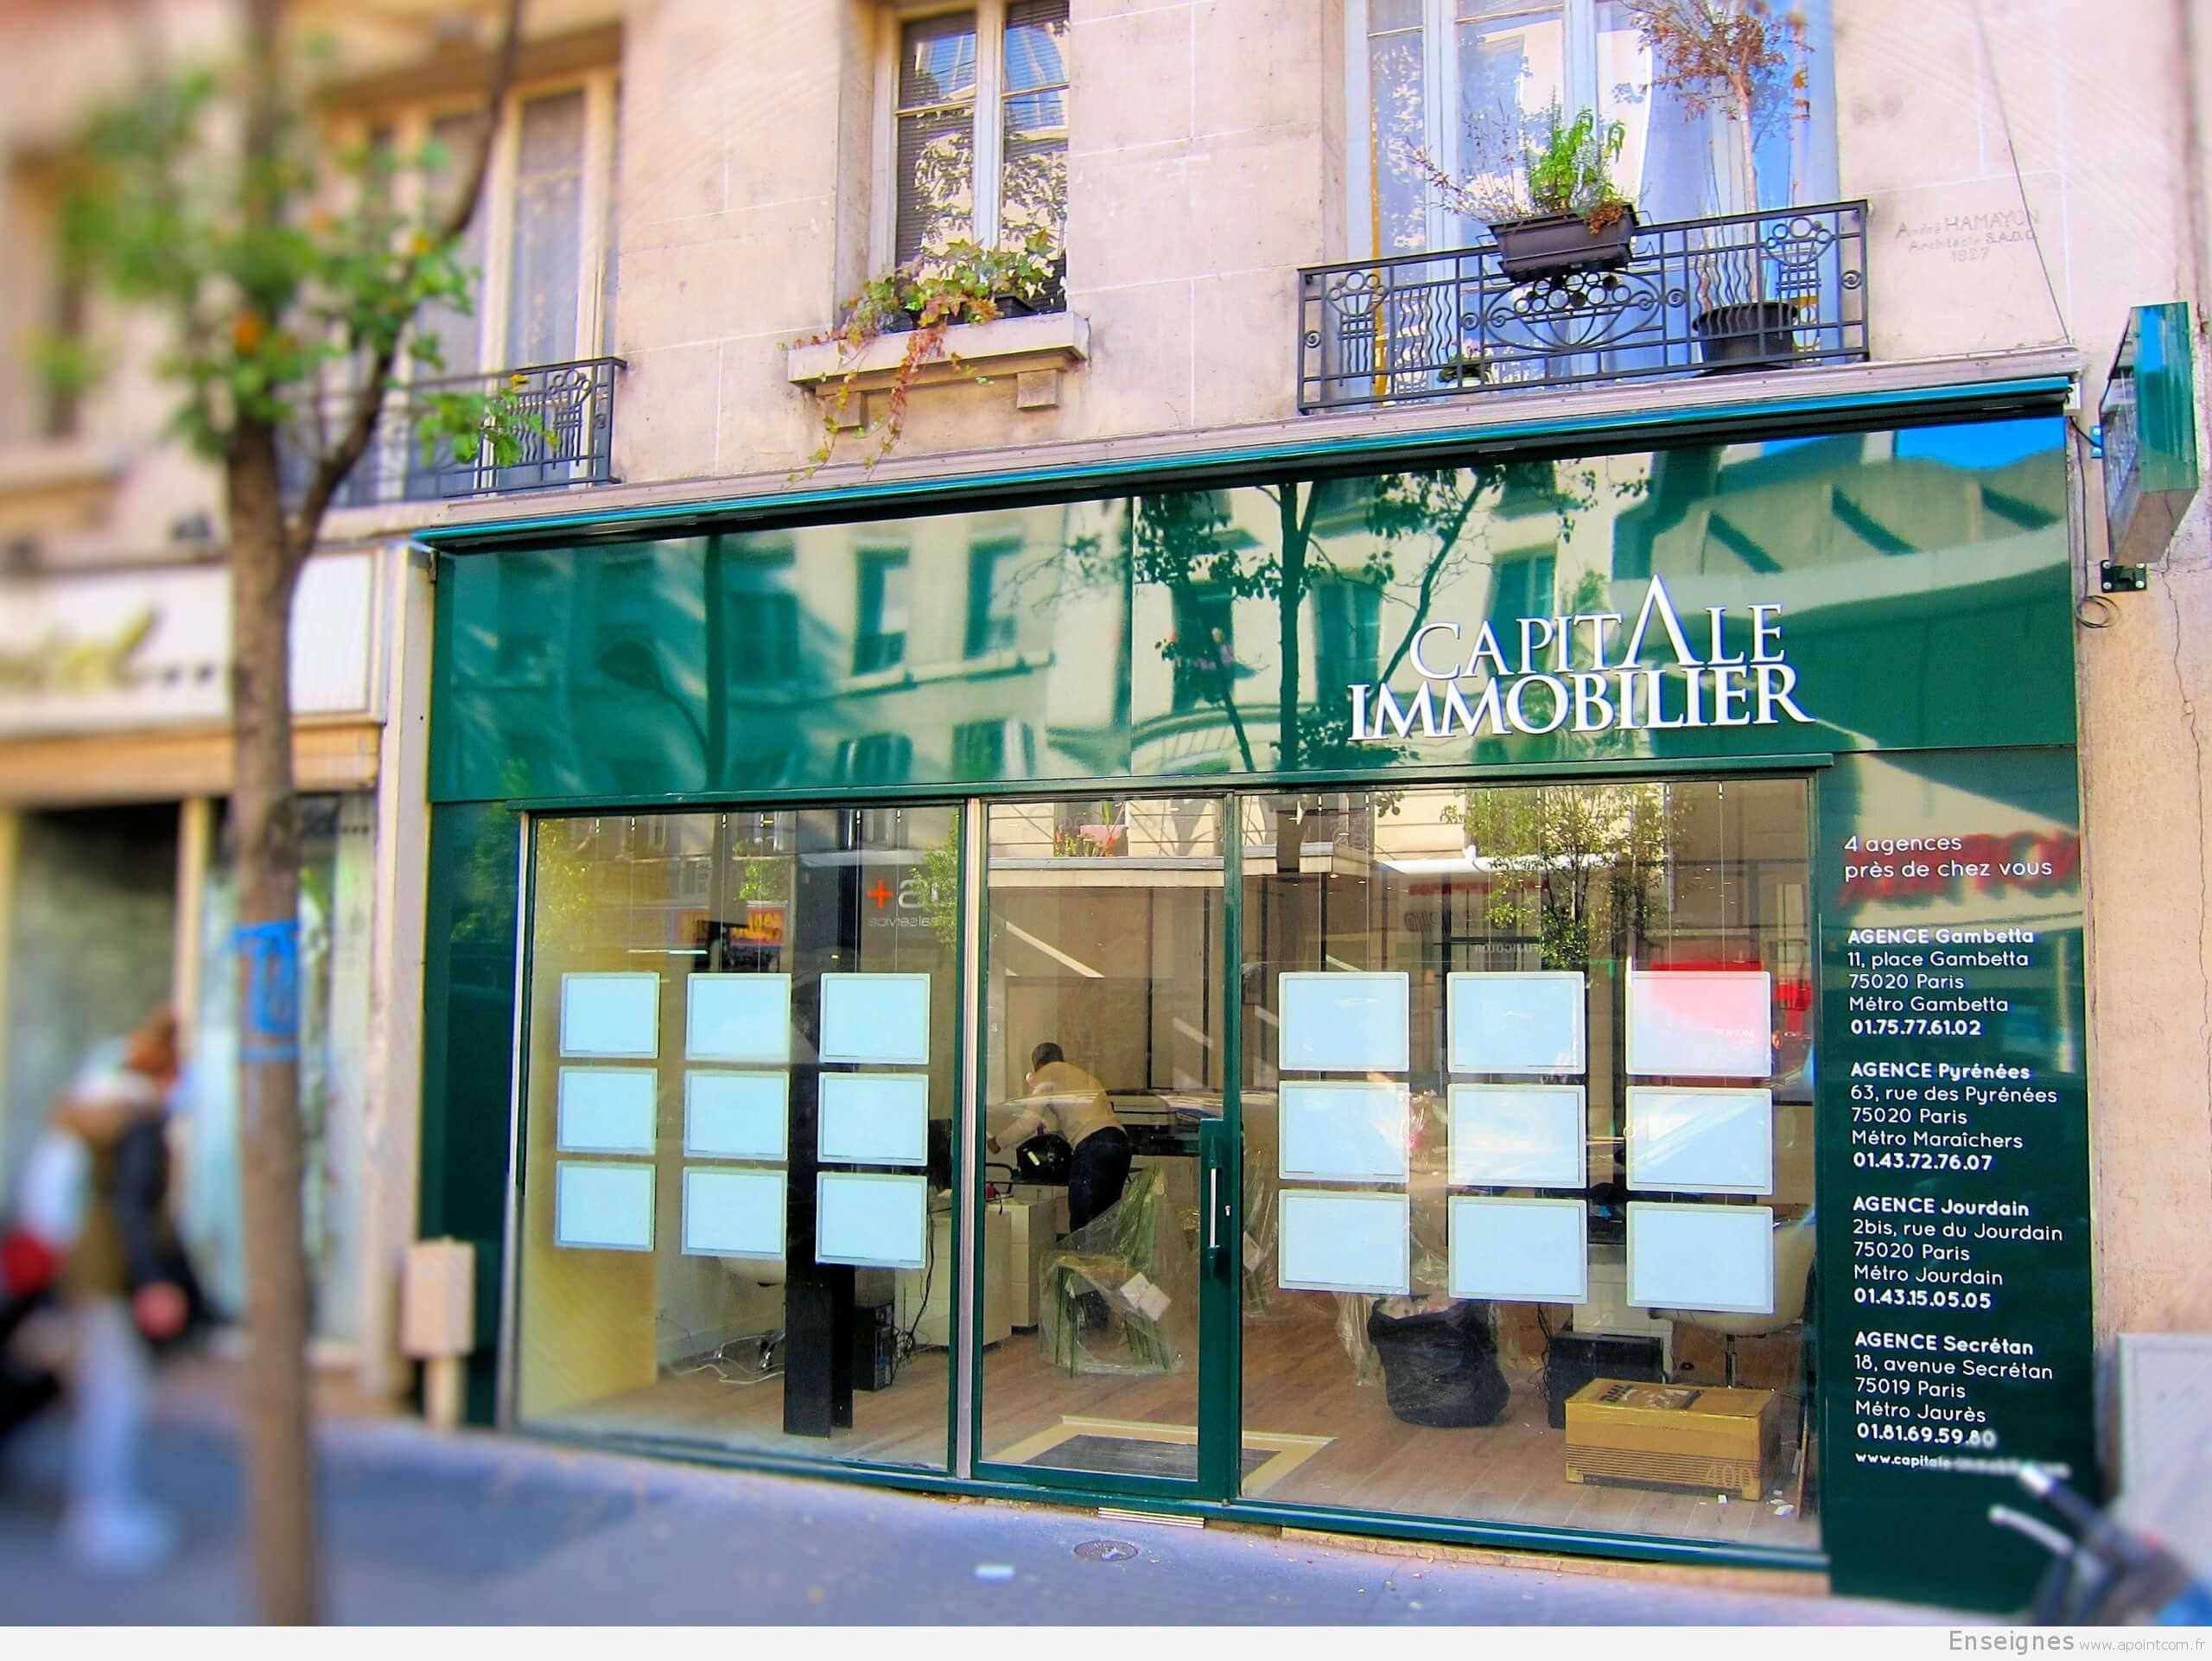 Enseigne agence immobili re paris capital immobilier for Immobilier appartement atypique paris